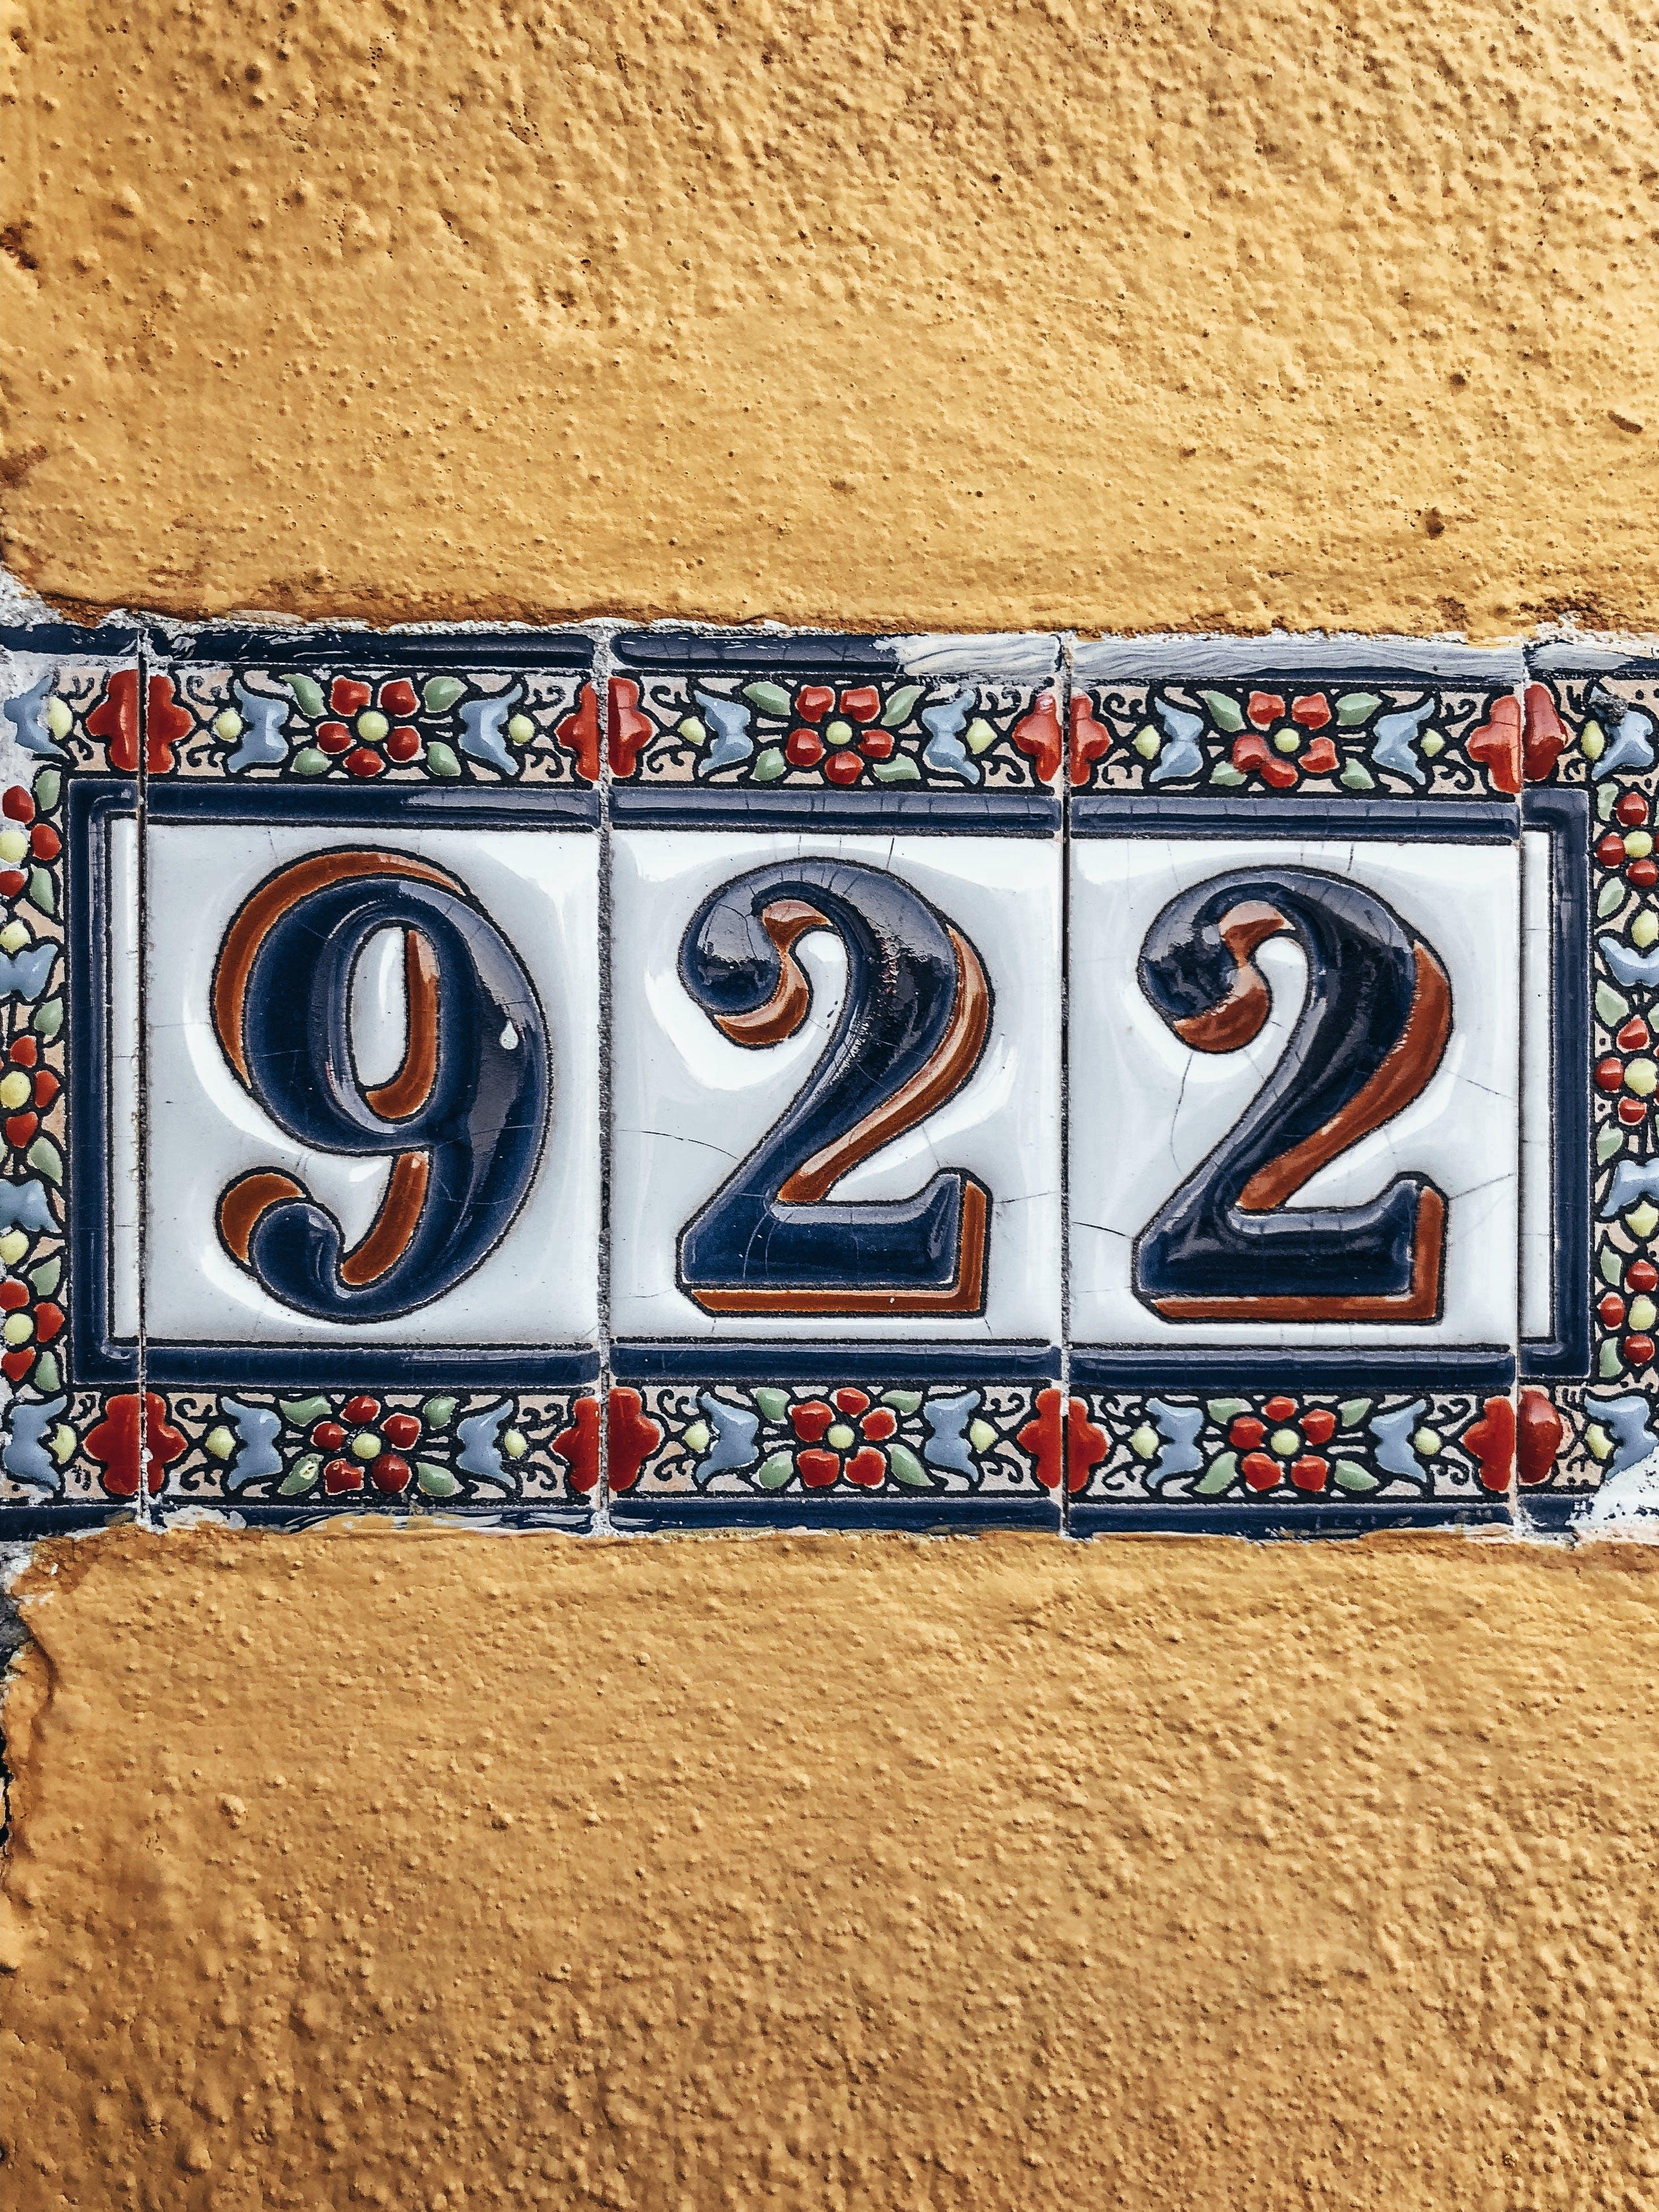 922 Tile